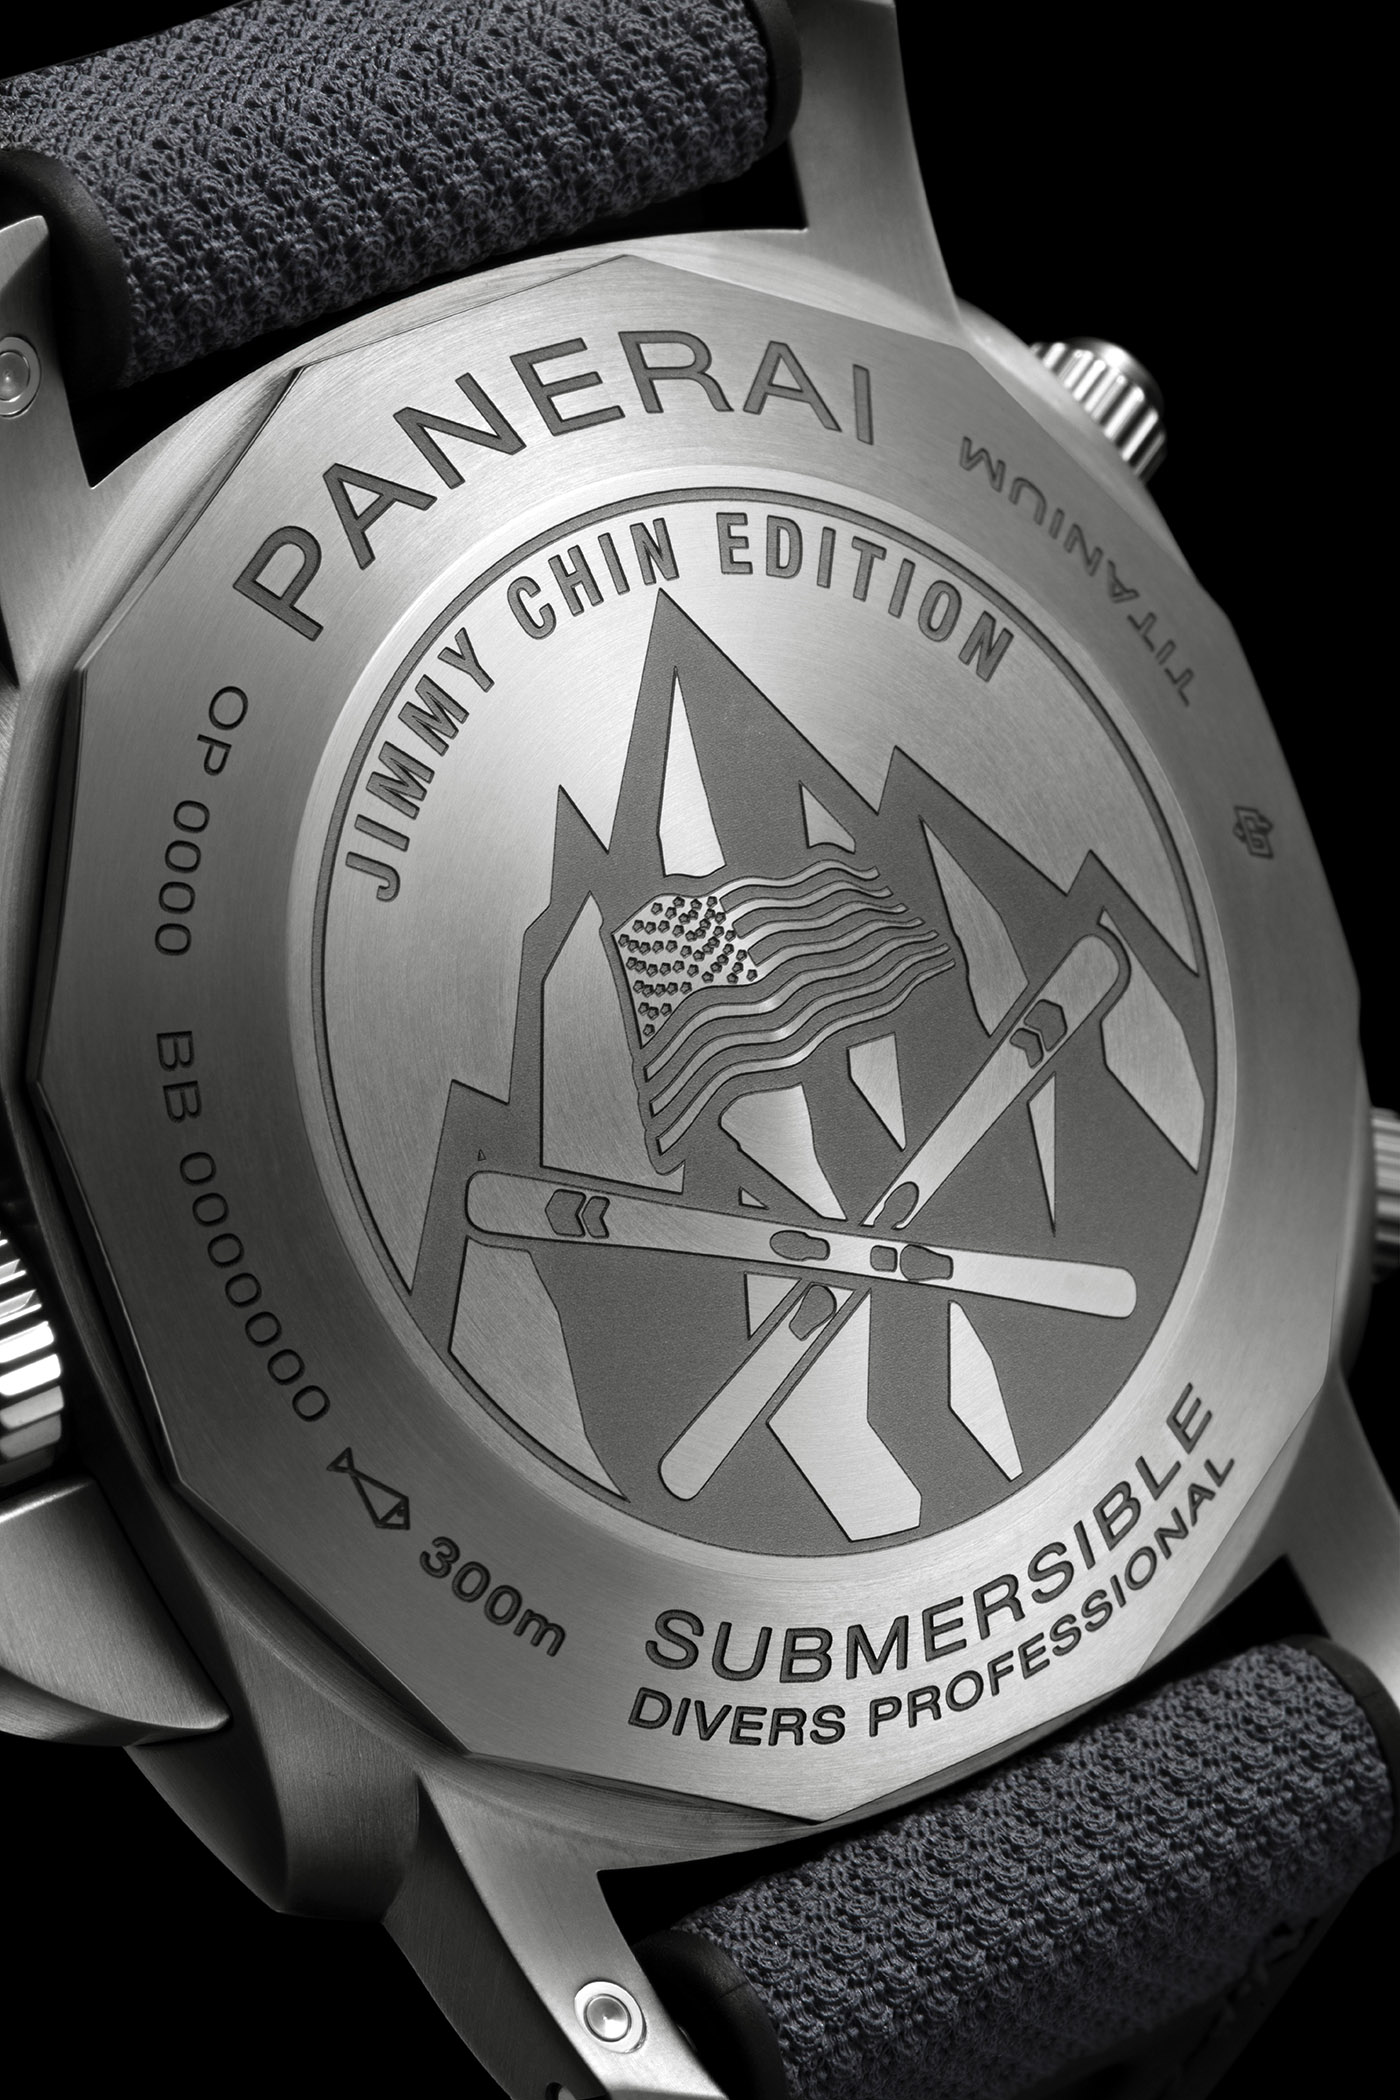 Panerai представляет погружные часы Chrono Flyback - J. Chin Edition